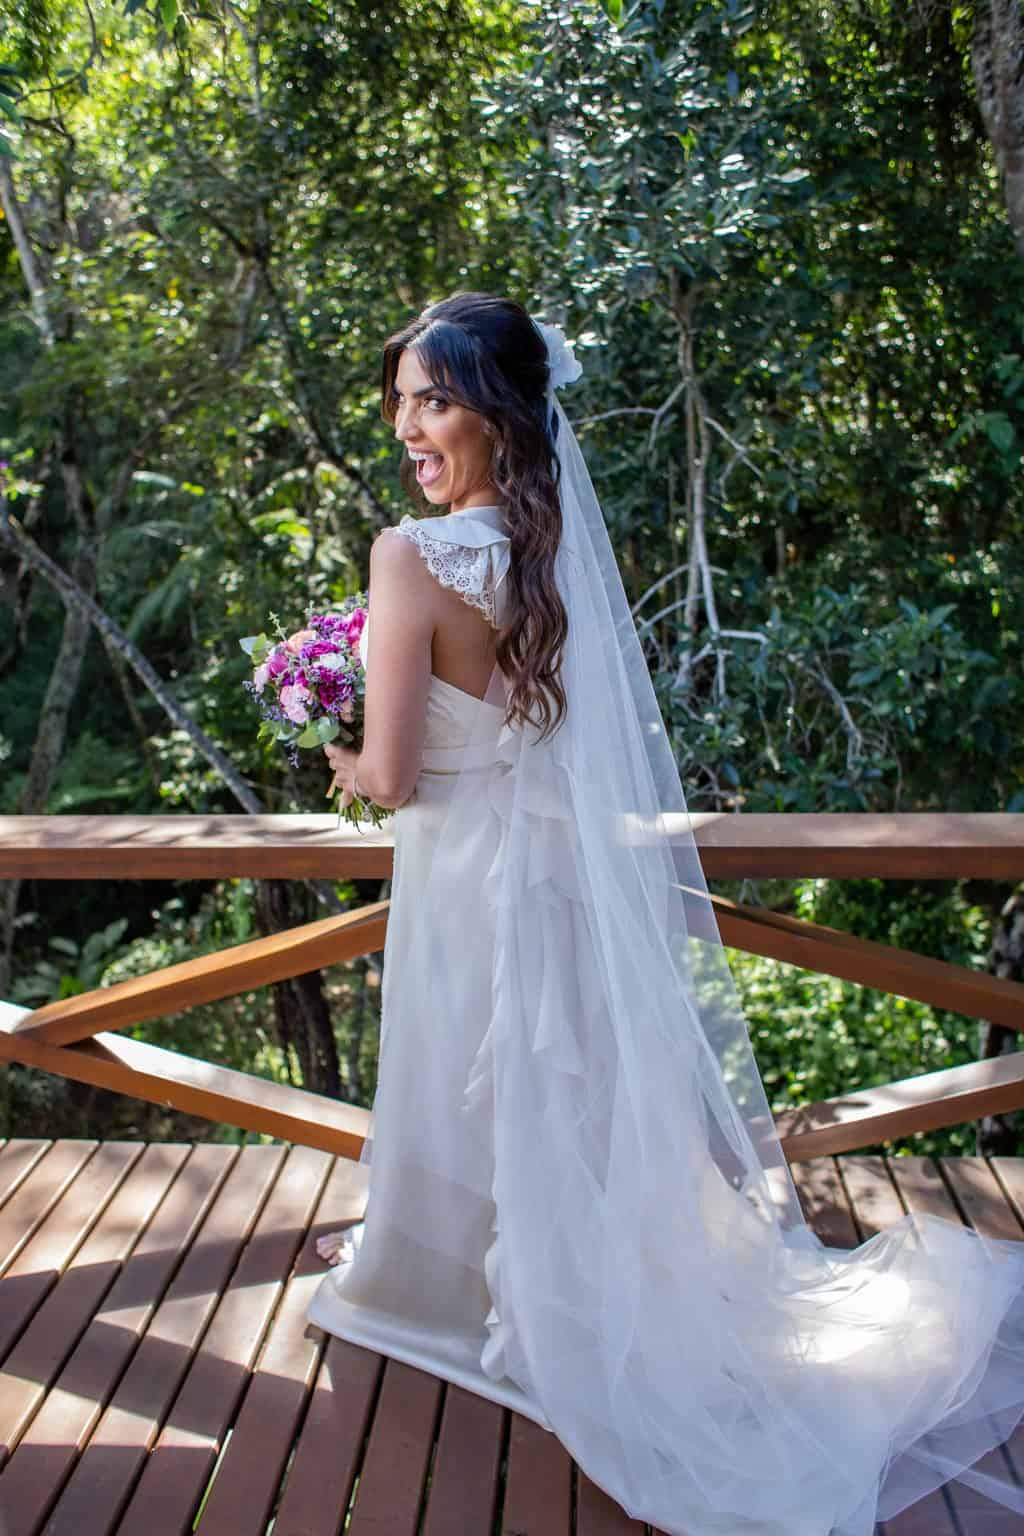 beleza-da-noiva-Casamento-Juliana-e-Sebastian-making-of-Pousada-La-Belle-Bruna89